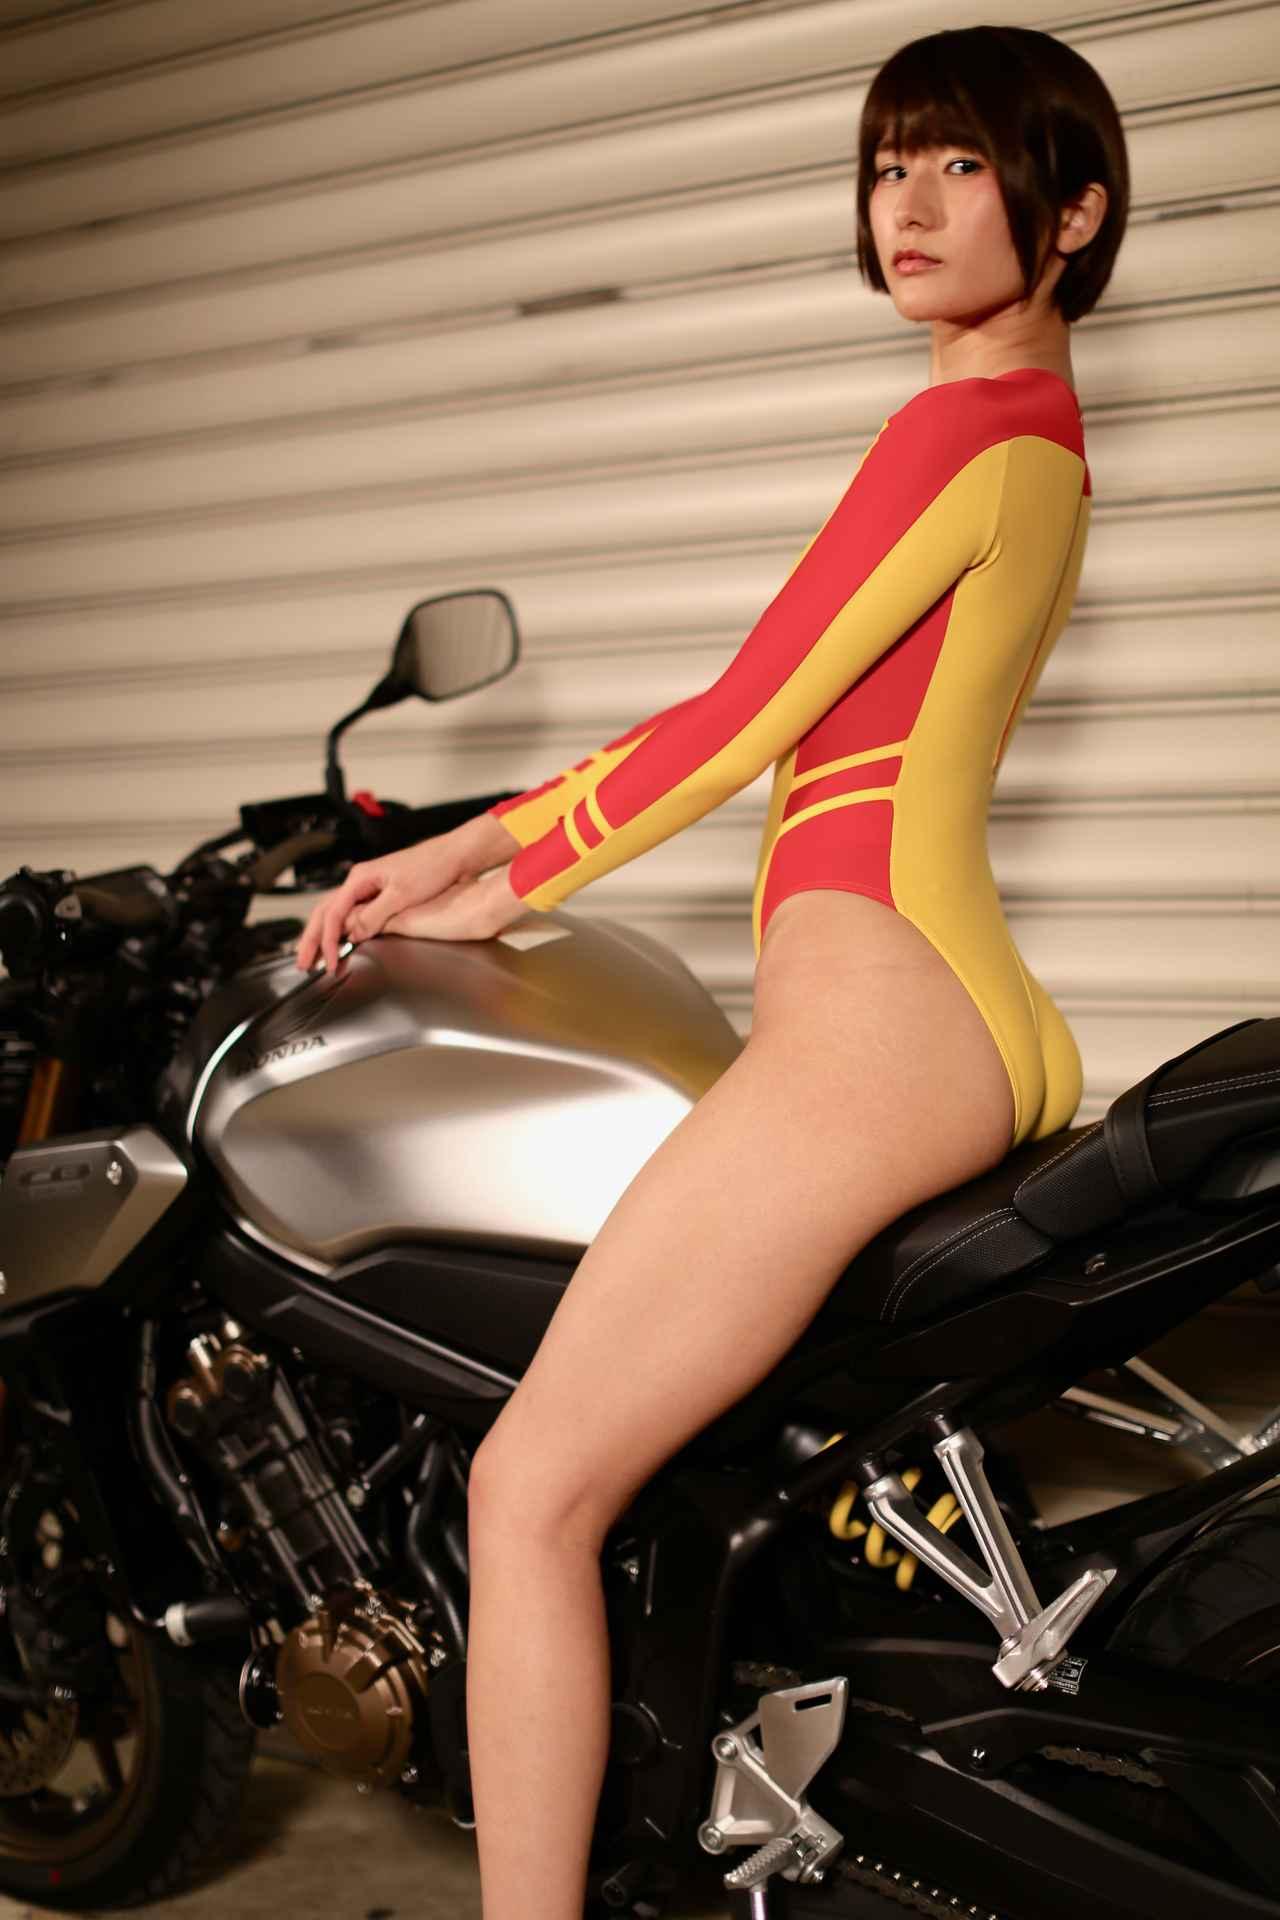 Images : 7番目の画像 - 「【Beauty & Bike】うさことCB650R Vol.02」のアルバム - LAWRENCE - Motorcycle x Cars + α = Your Life.